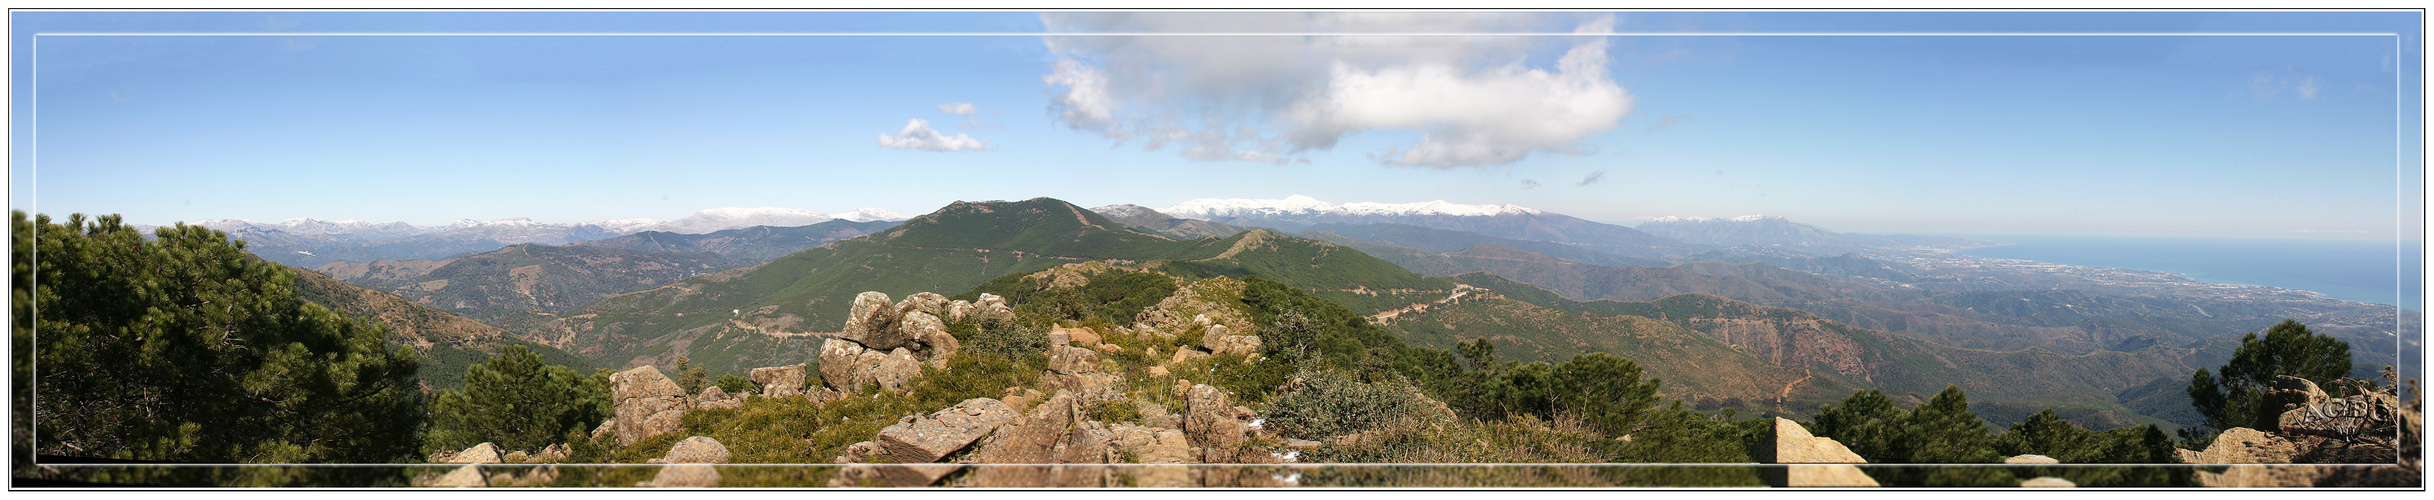 Sierra de Ronda nevada desde Sierra Bermeja (Estepona, Malaga). Panoramica 5 Img.